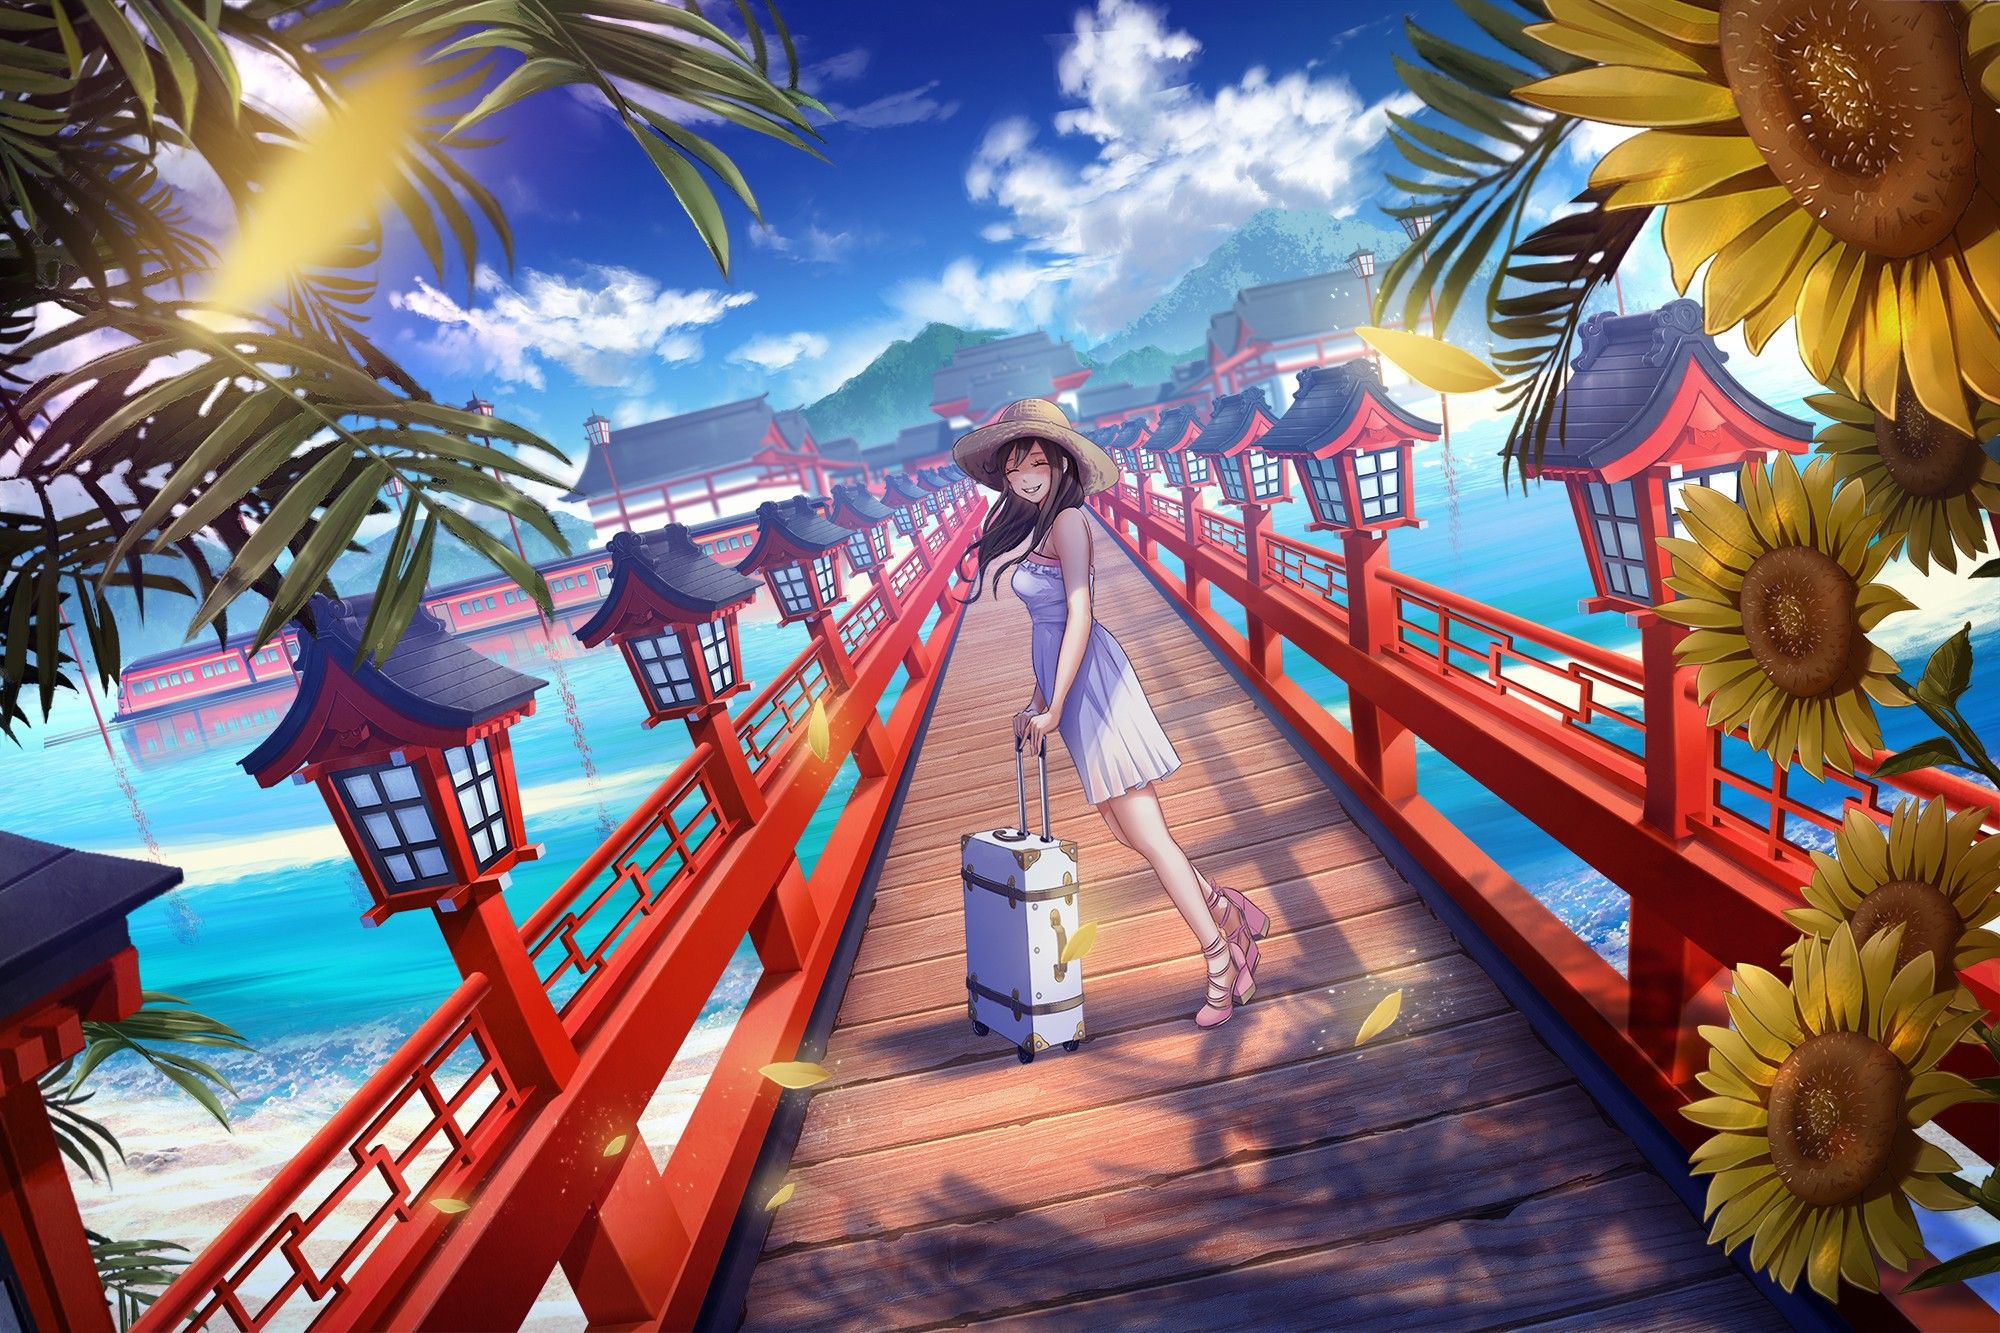 Long Hair Anime Anime Girls Beach Clouds Dress Flowers Hat Sky Sunflowers Water Wallpaper No Girasoles Temas Anime Personajes De Anime